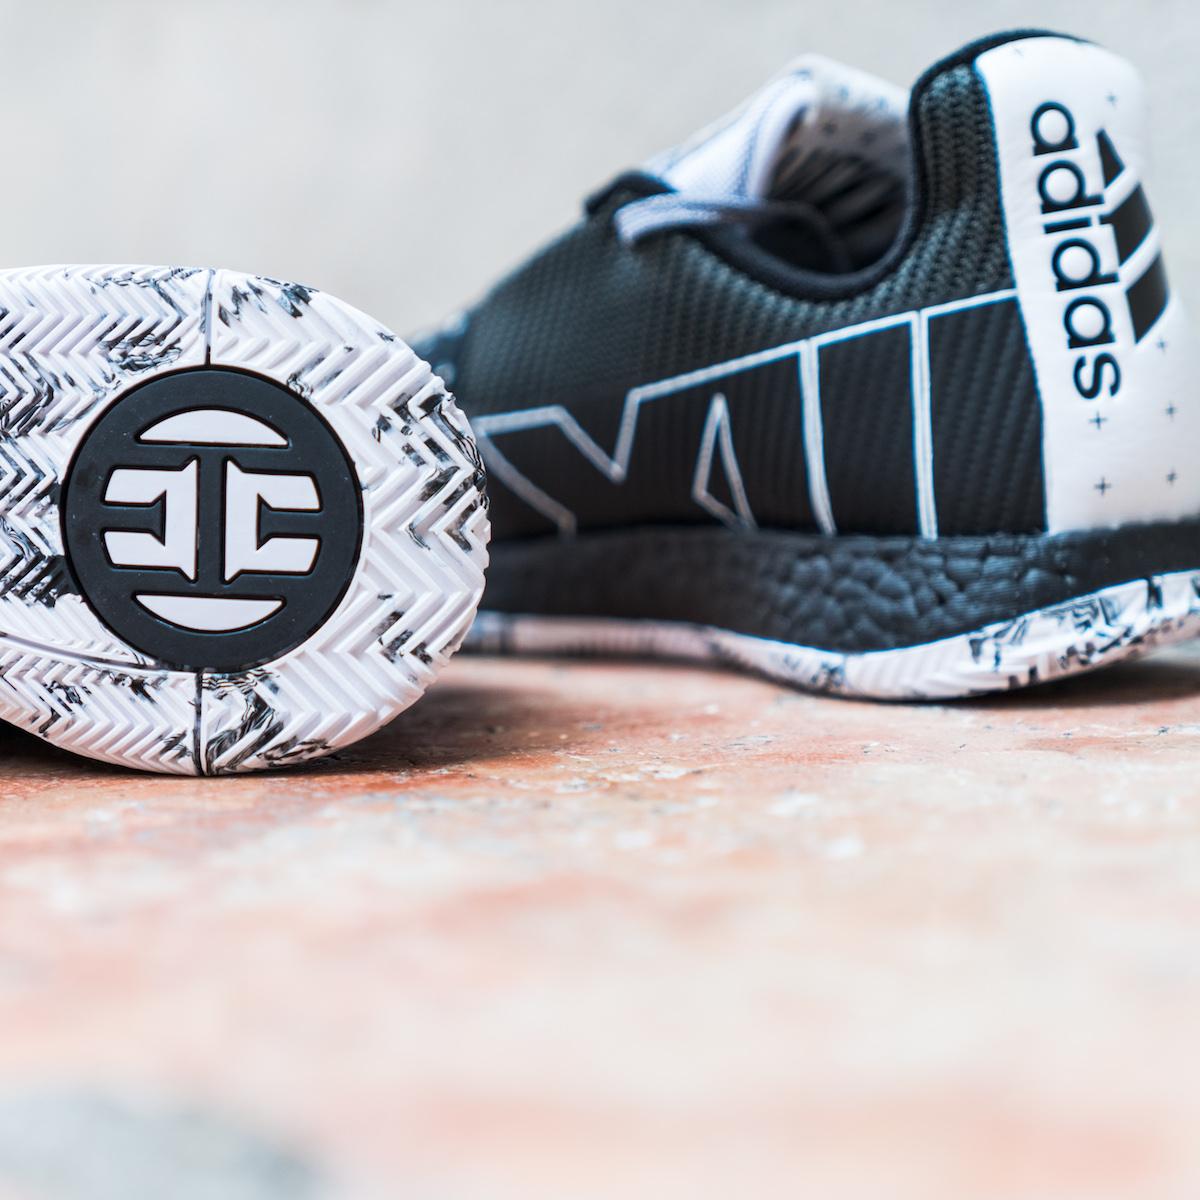 HARDEN VOL. 3 BLACK | Adidas | BB7723